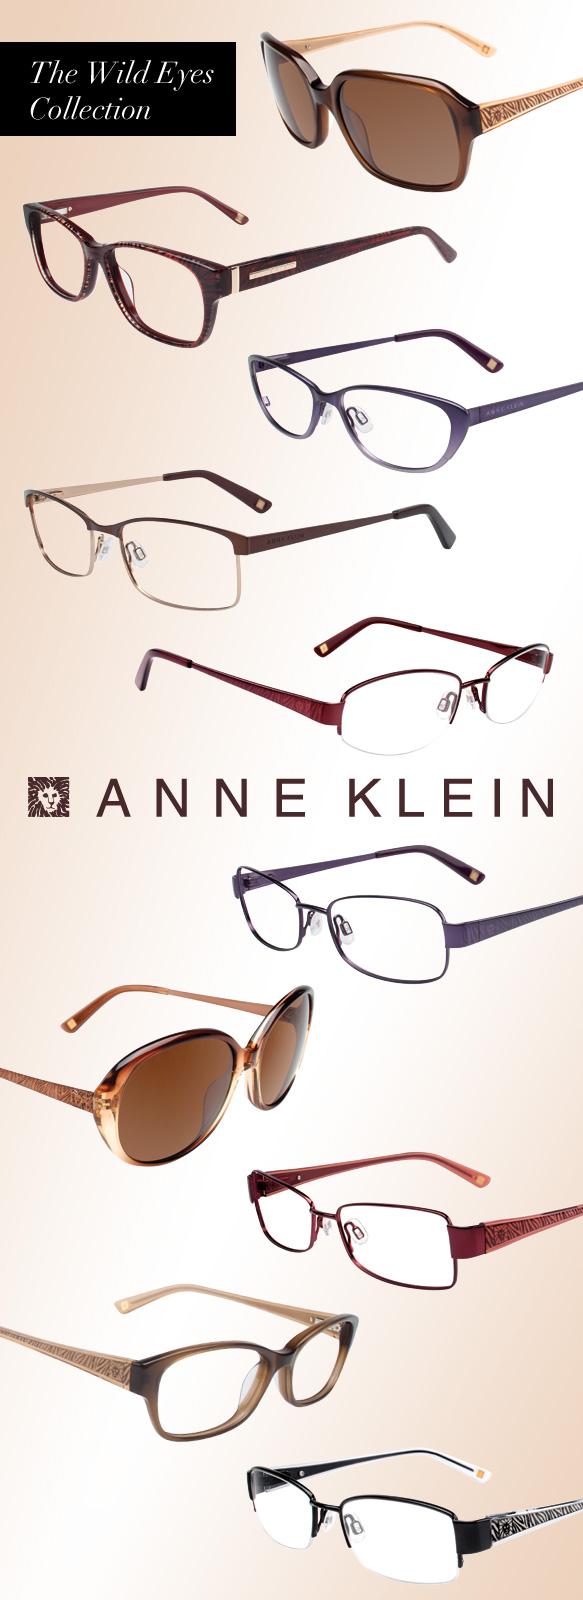 0c3b38aeee Anne Klein Debuts New Eyewear Collections – Eyecessorize